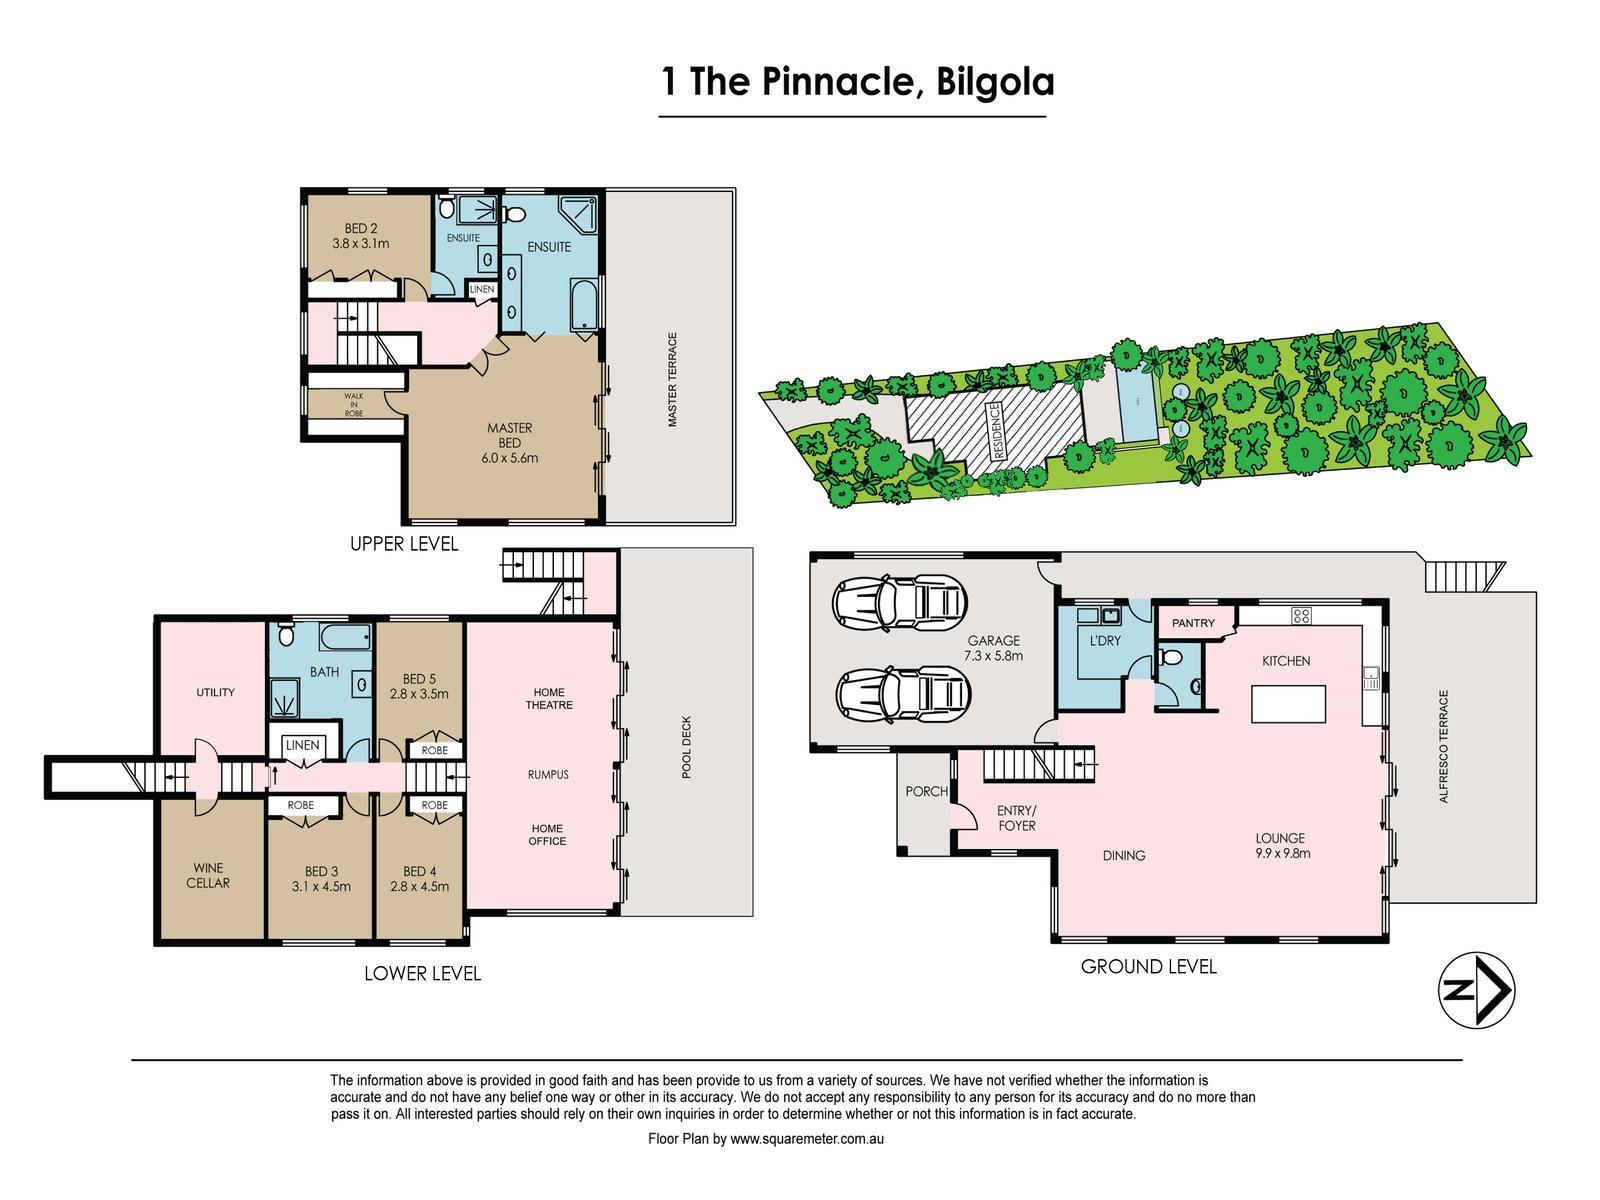 1 The Pinnacle, Bilgola